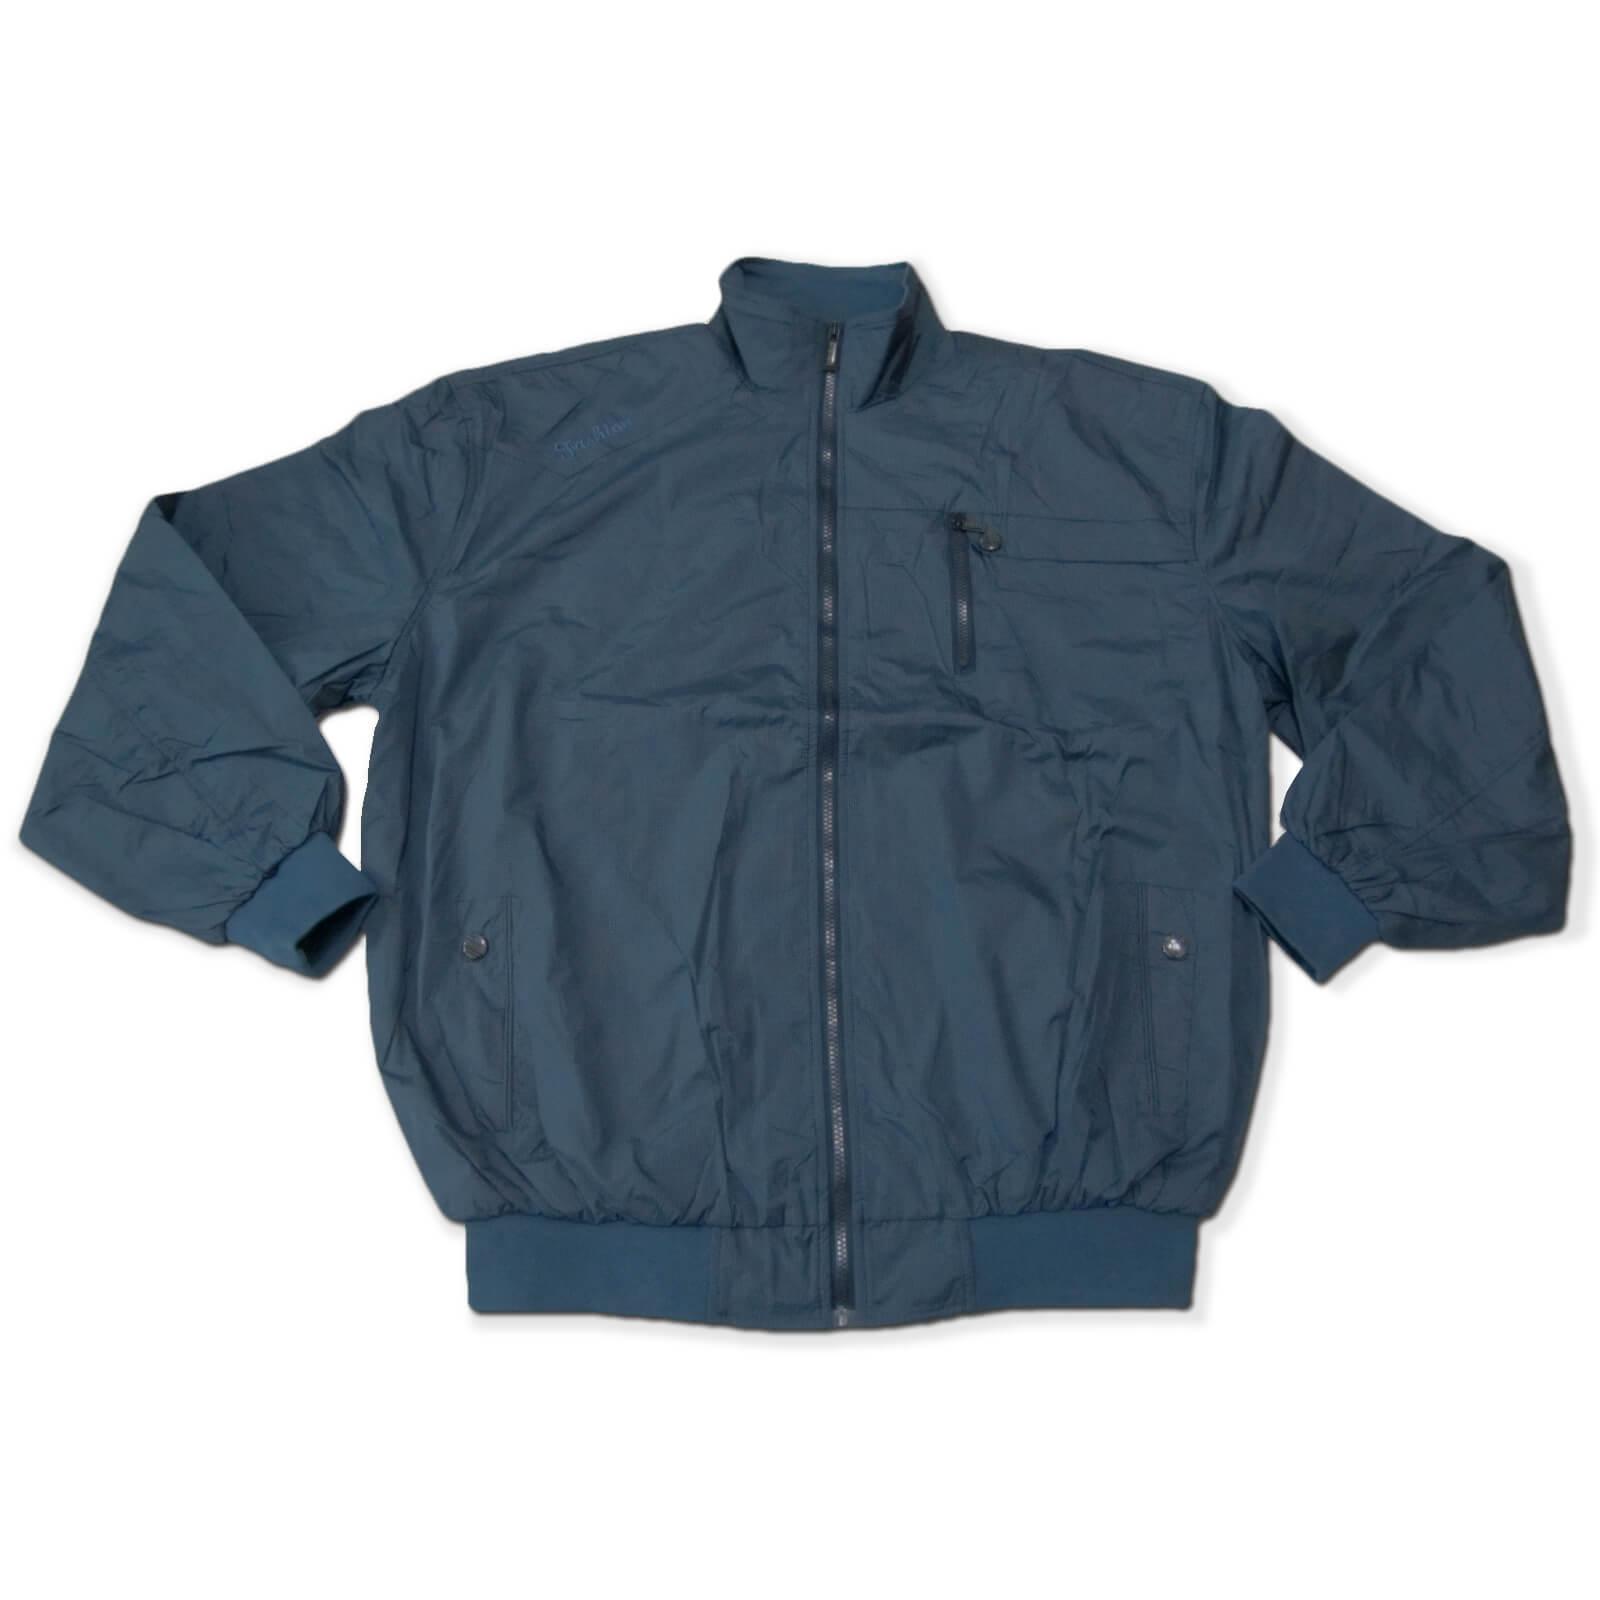 sun-e加大尺碼風衣外套、加大尺碼細格紋外套、加大尺碼夾克外套、加大尺碼防風外套、加大尺碼騎士外套(312-8882-08)藍綠色細格紋、(312-8882-21)灰色細格紋 胸圍:3L 4L(58~60英吋) [實體店面保障] 1